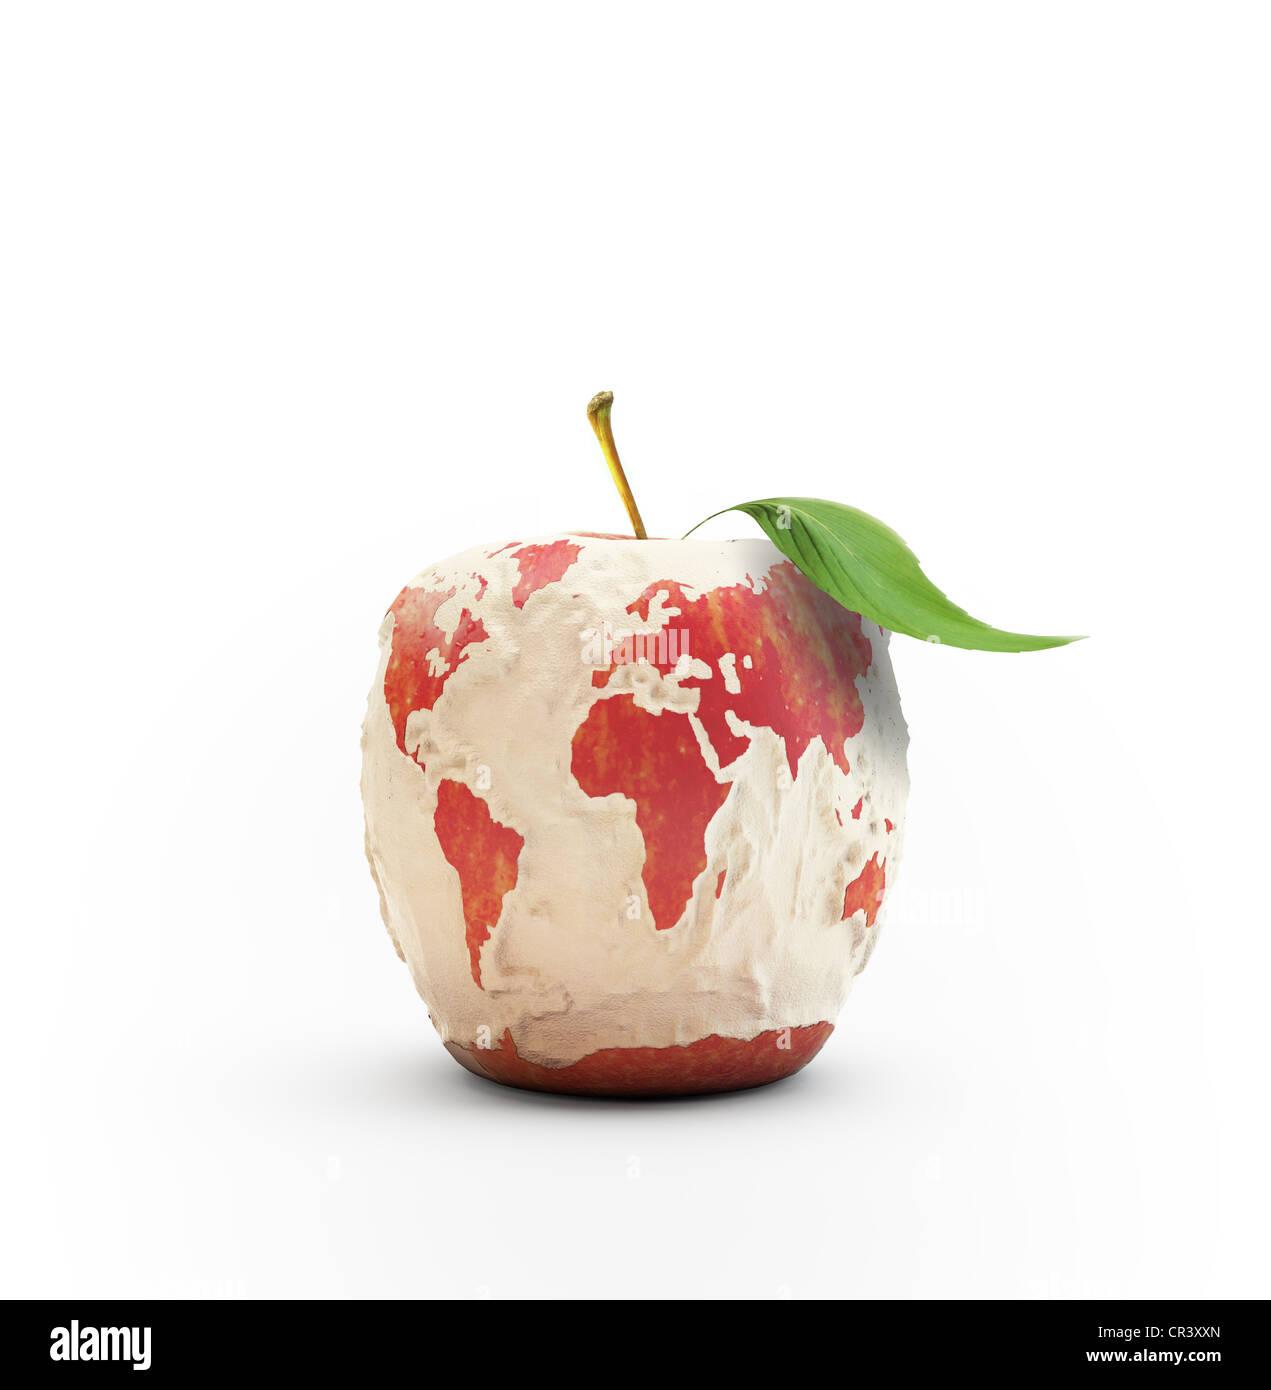 Mela sbucciata formante la mappa del mondo Foto Stock